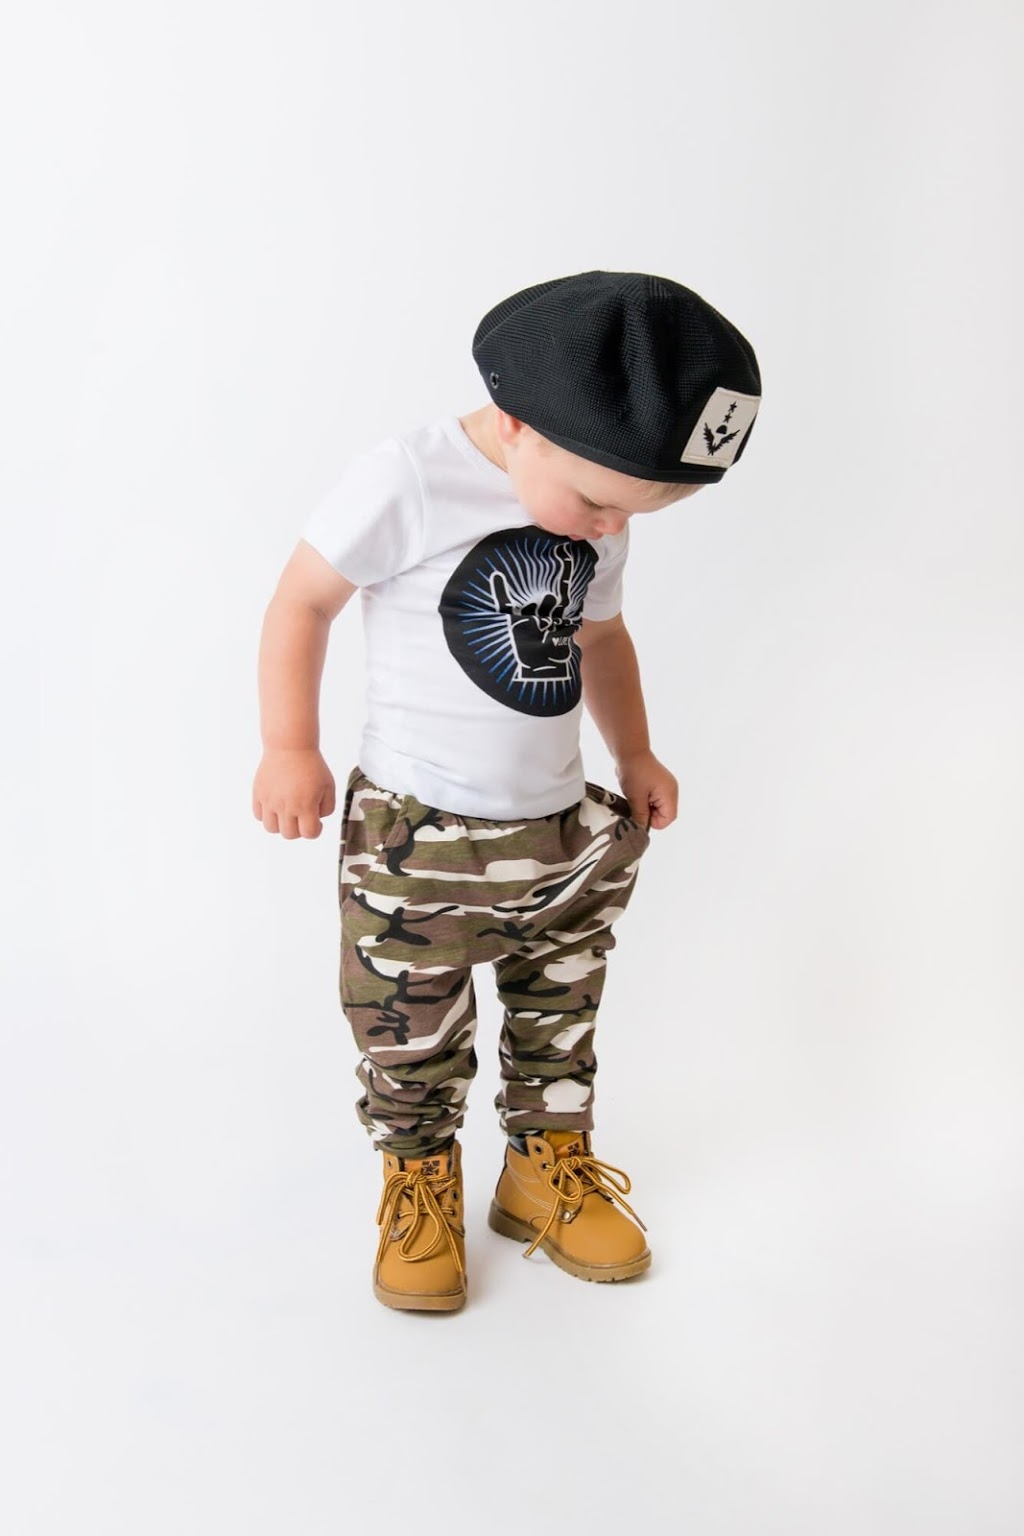 Dapper Little Dude | clothing store | Raven St, Gladesville NSW 2111, Australia | 0414570037 OR +61 414 570 037